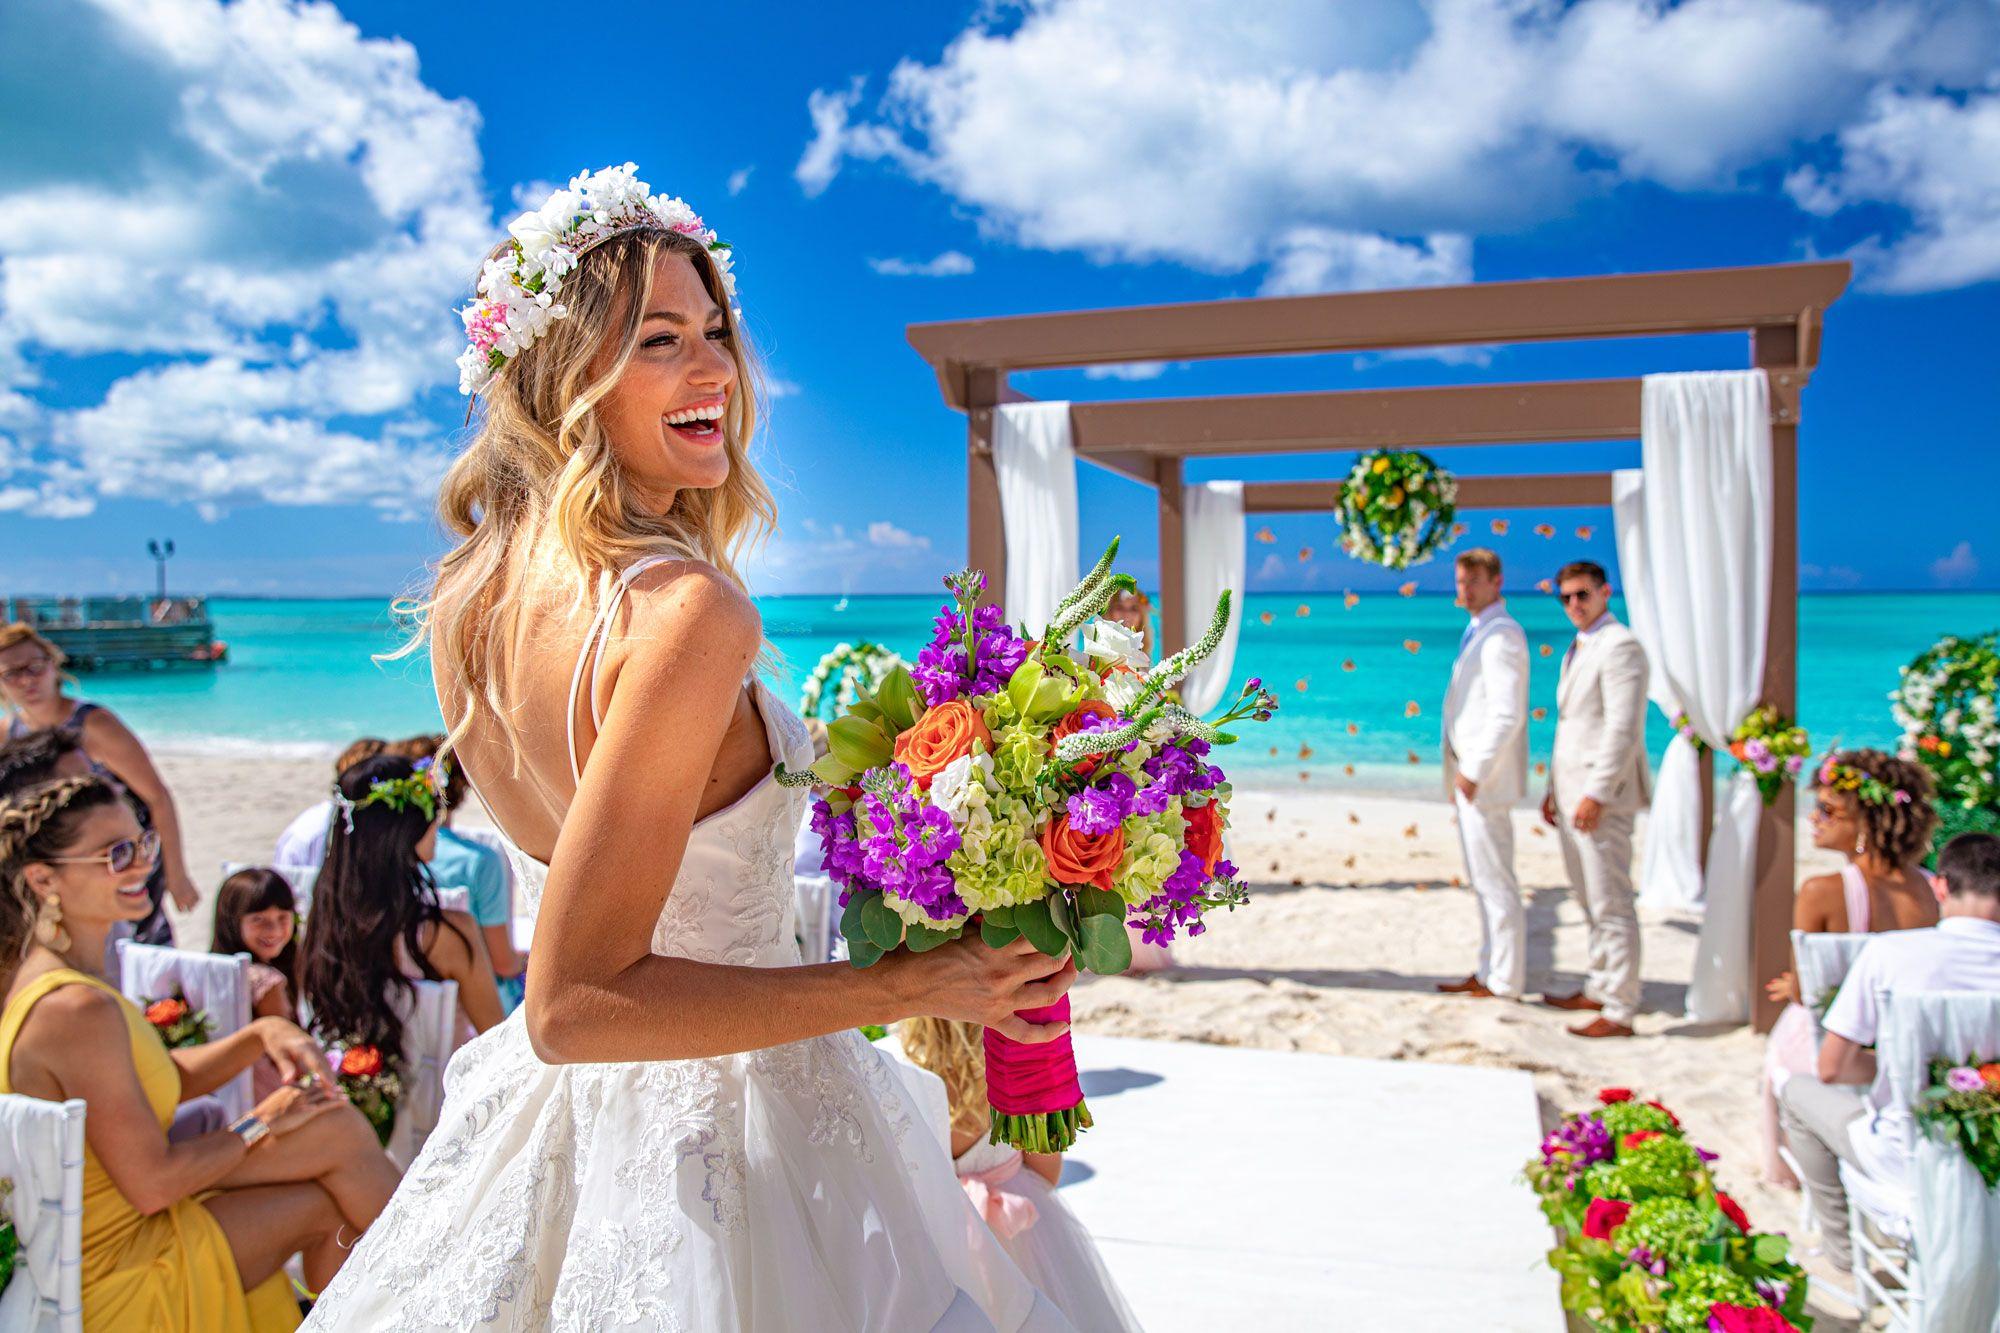 All Inclusive Caribbean Wedding Destination | Caribbean Wedding